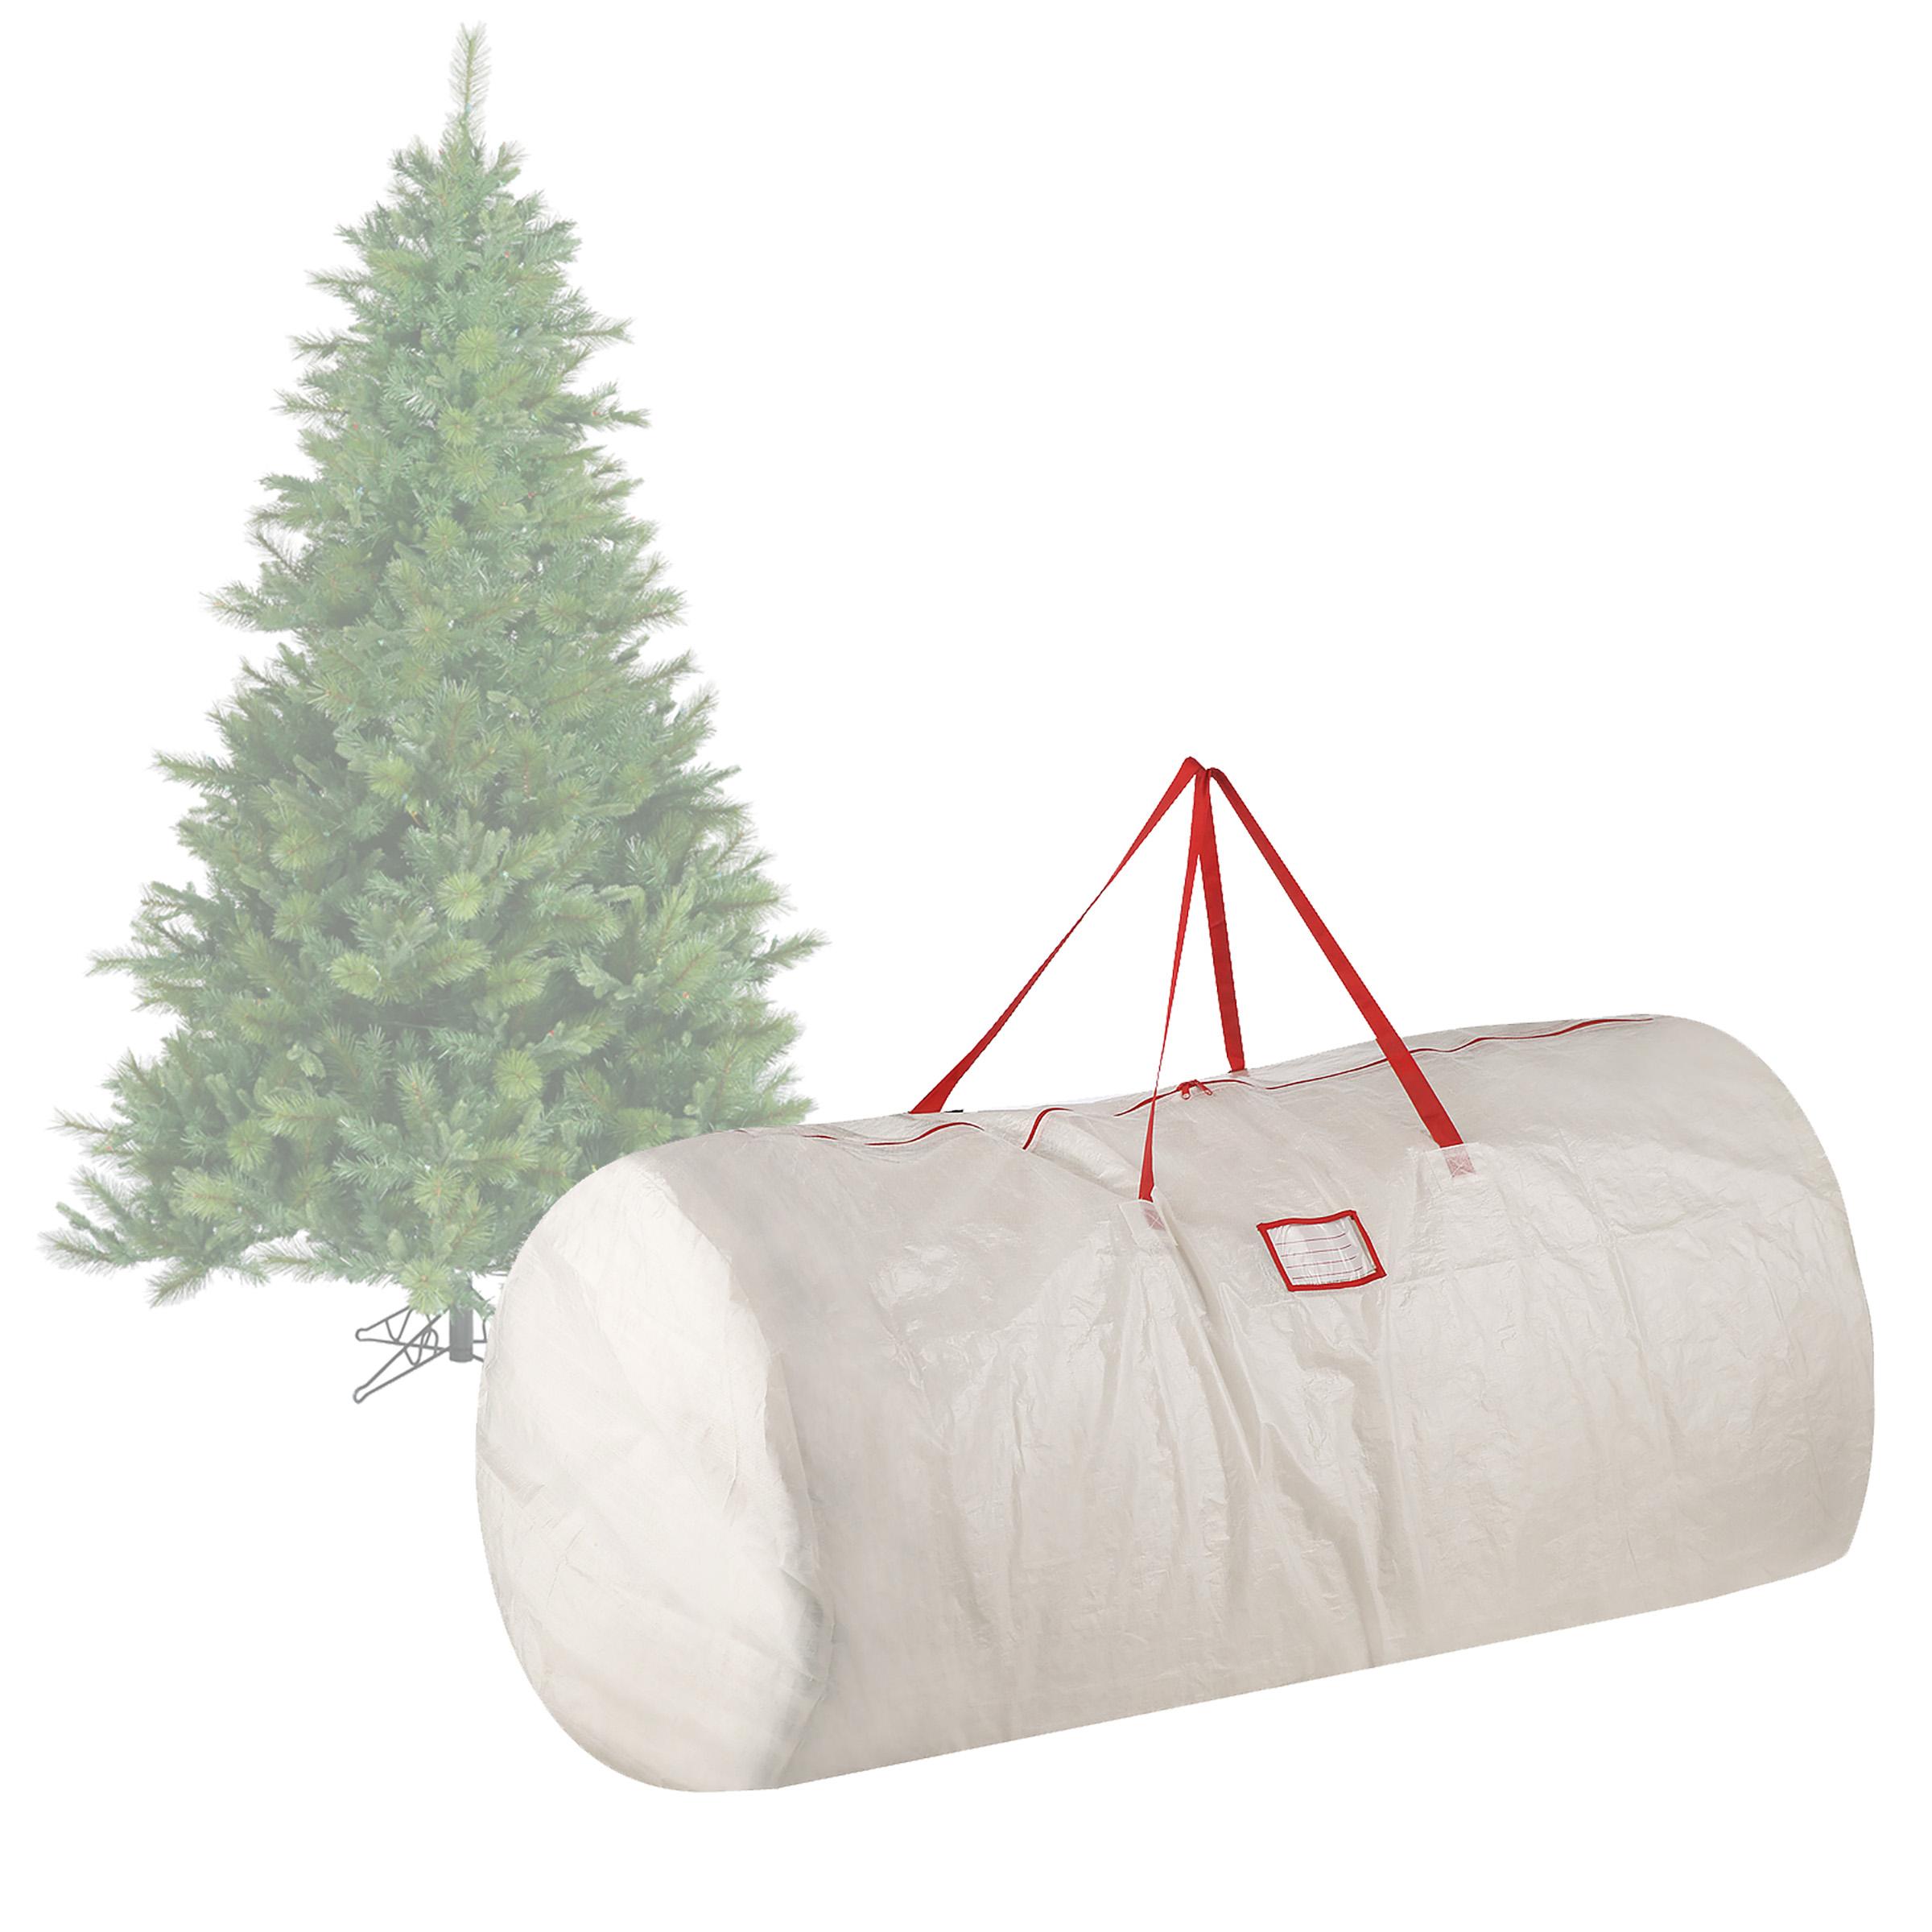 Elf Stor Premium White Holiday Christmas Tree Storage Bag Large For 9' Tree $8 + Free store pickup at Walmart